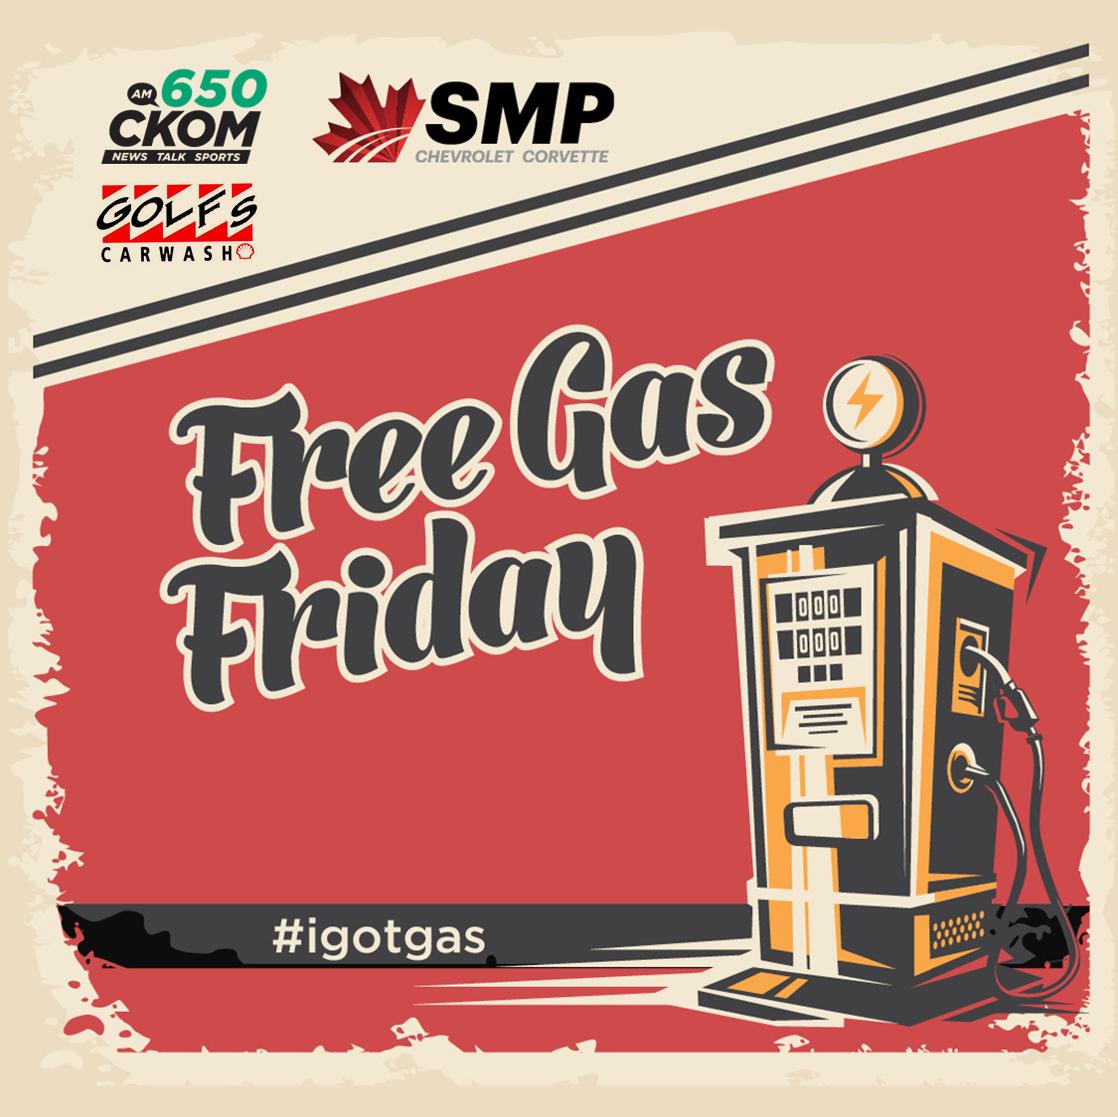 Free Gas Fridays